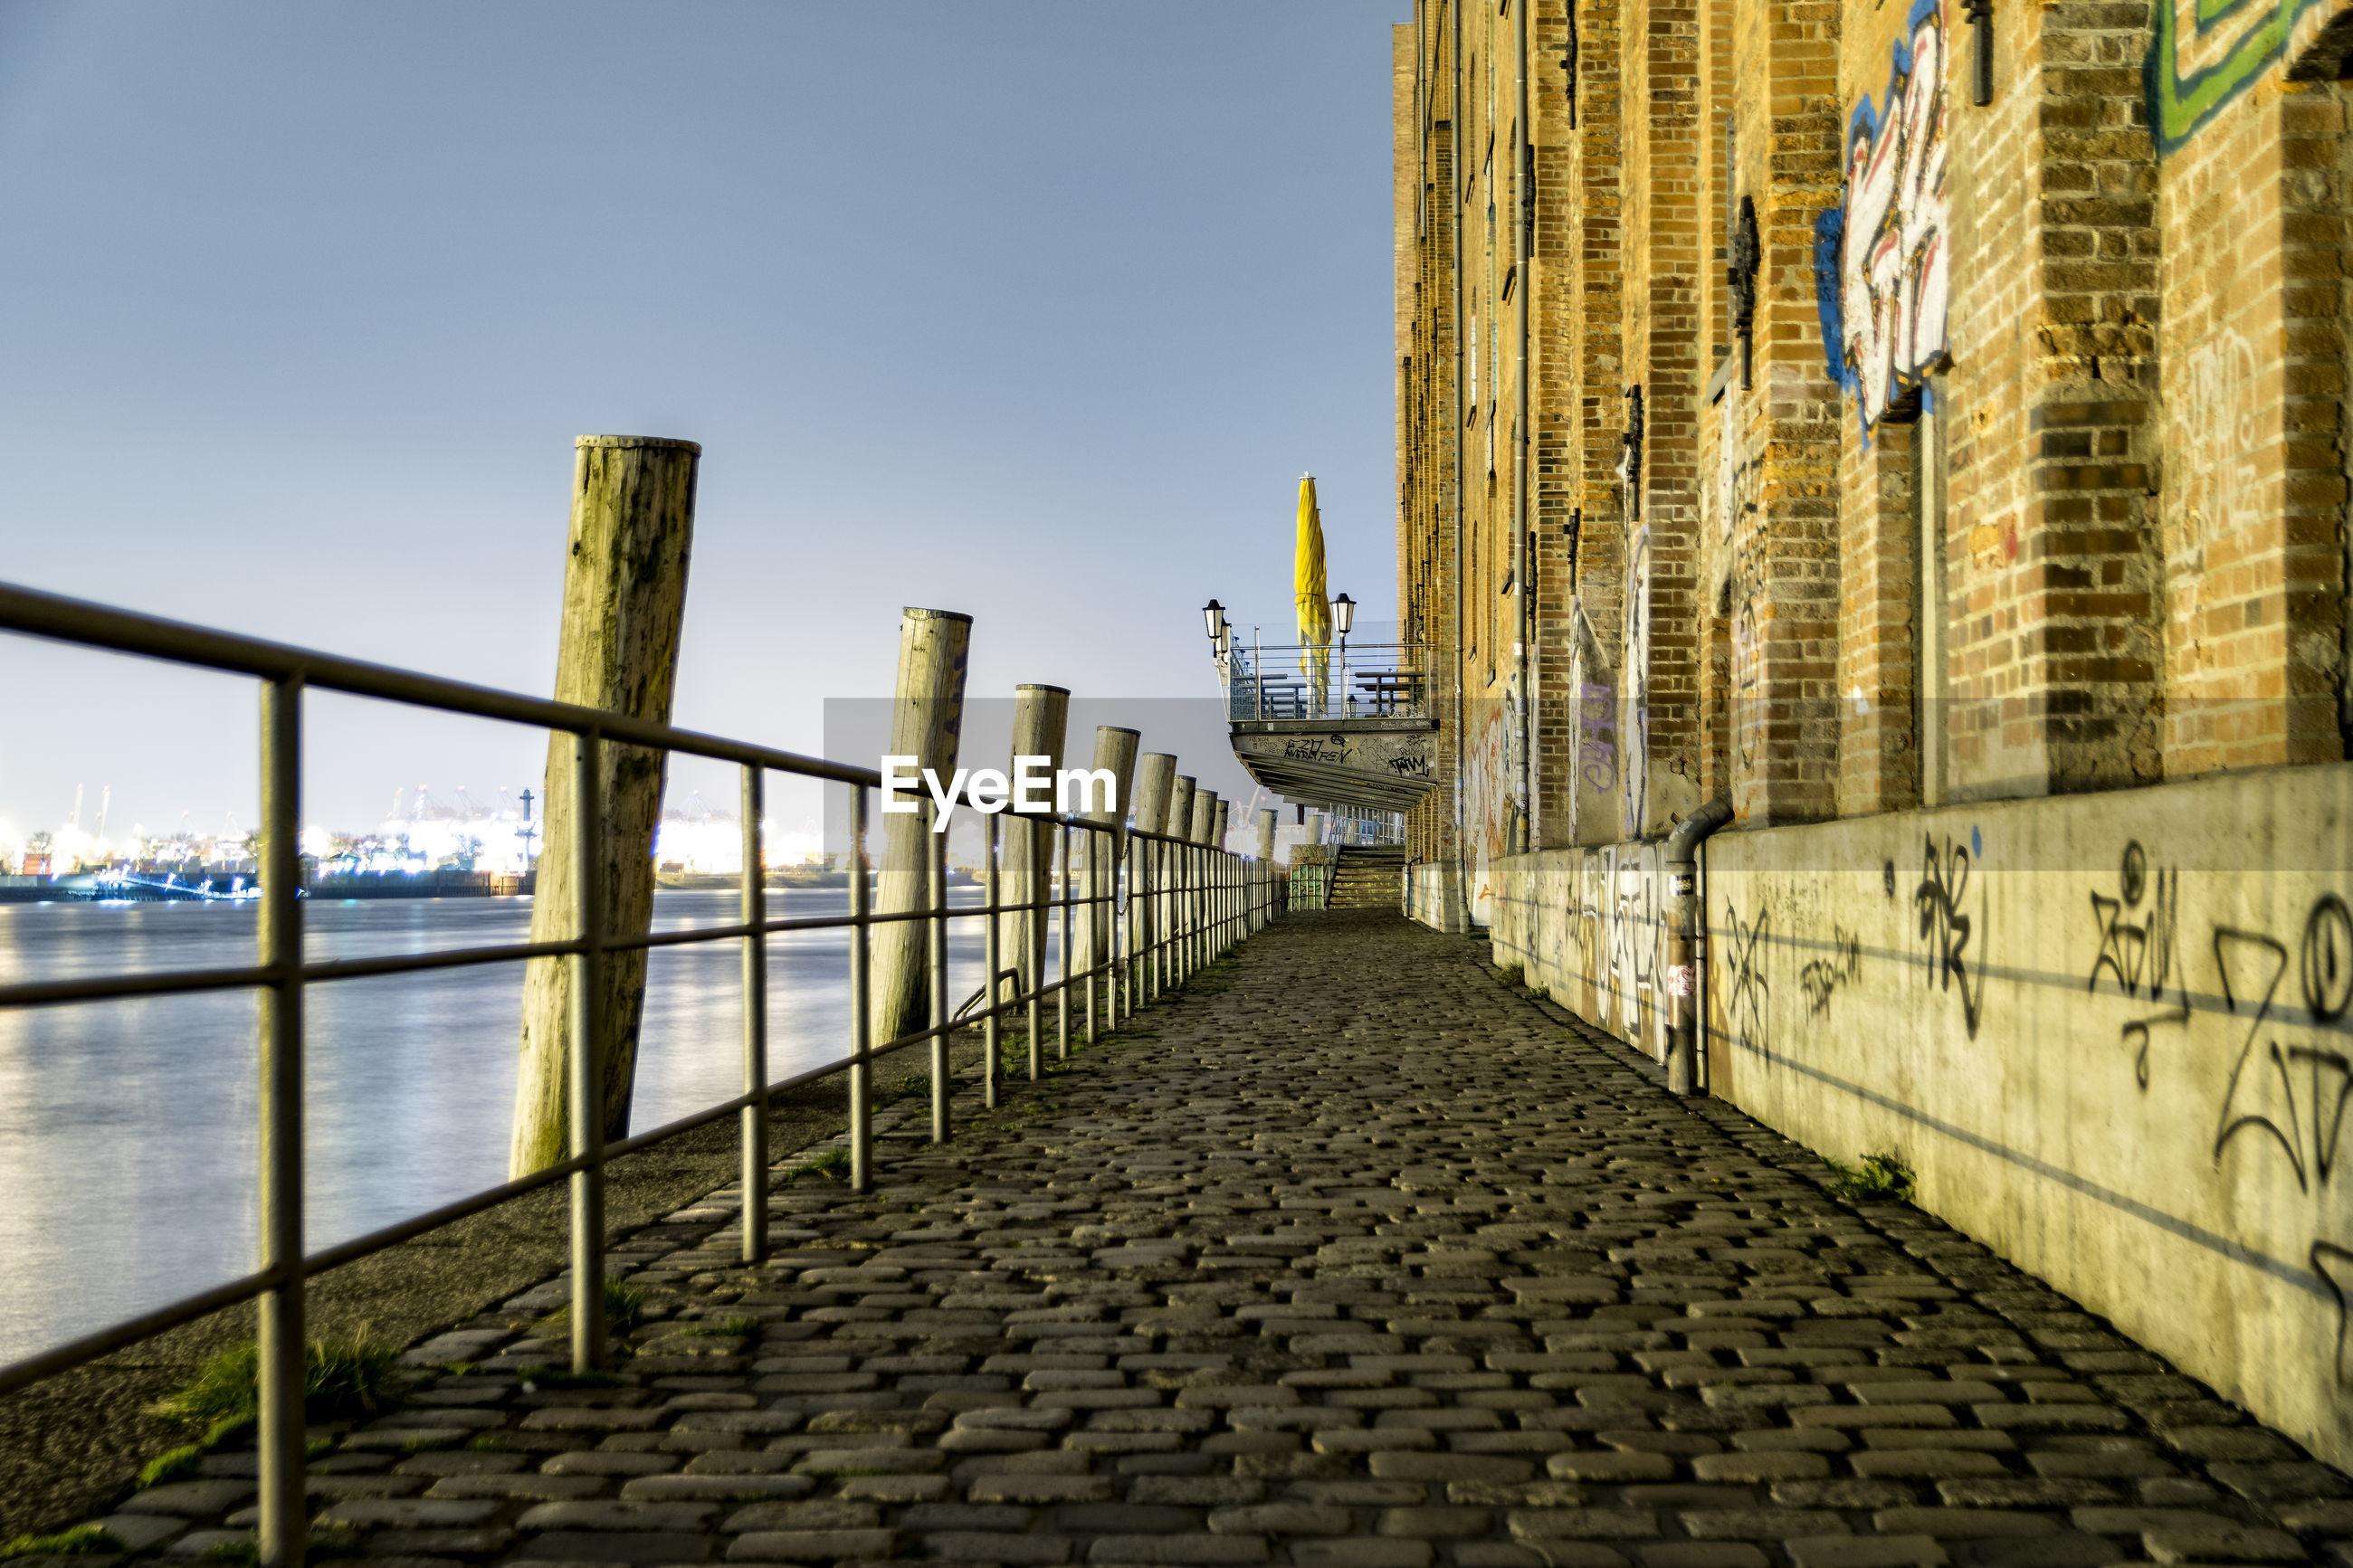 SIDEWALK BY CITY AGAINST CLEAR SKY